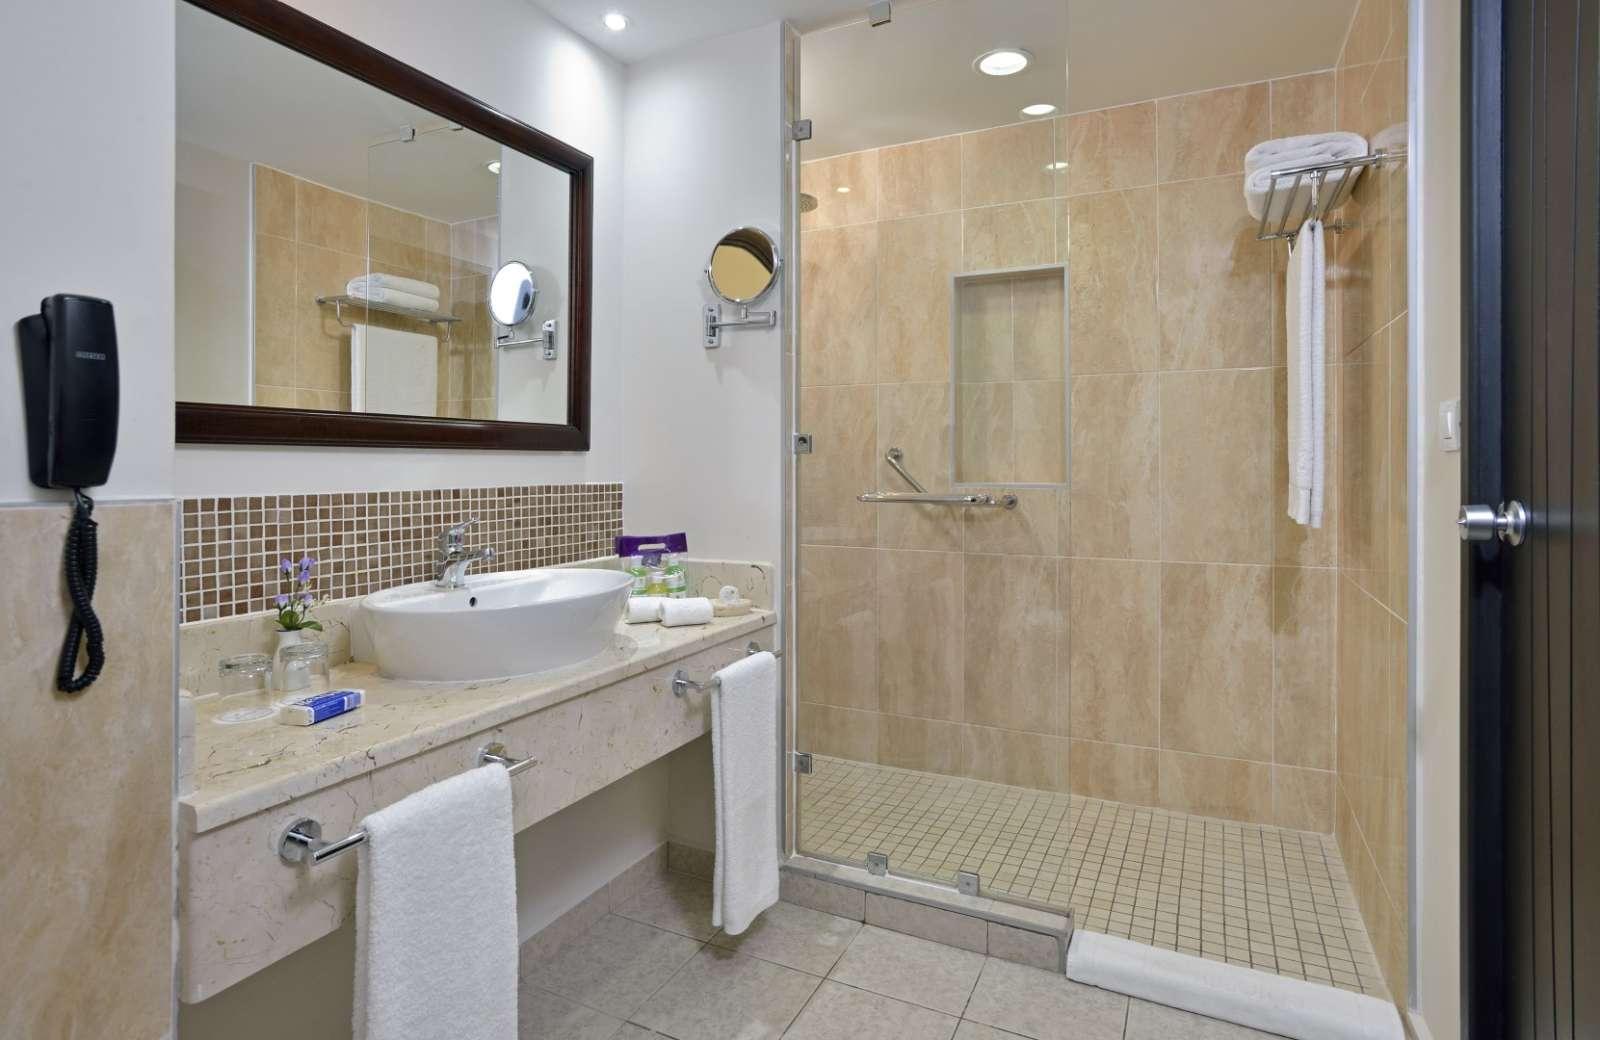 Bathroom at Paradisus Princesa Varadero